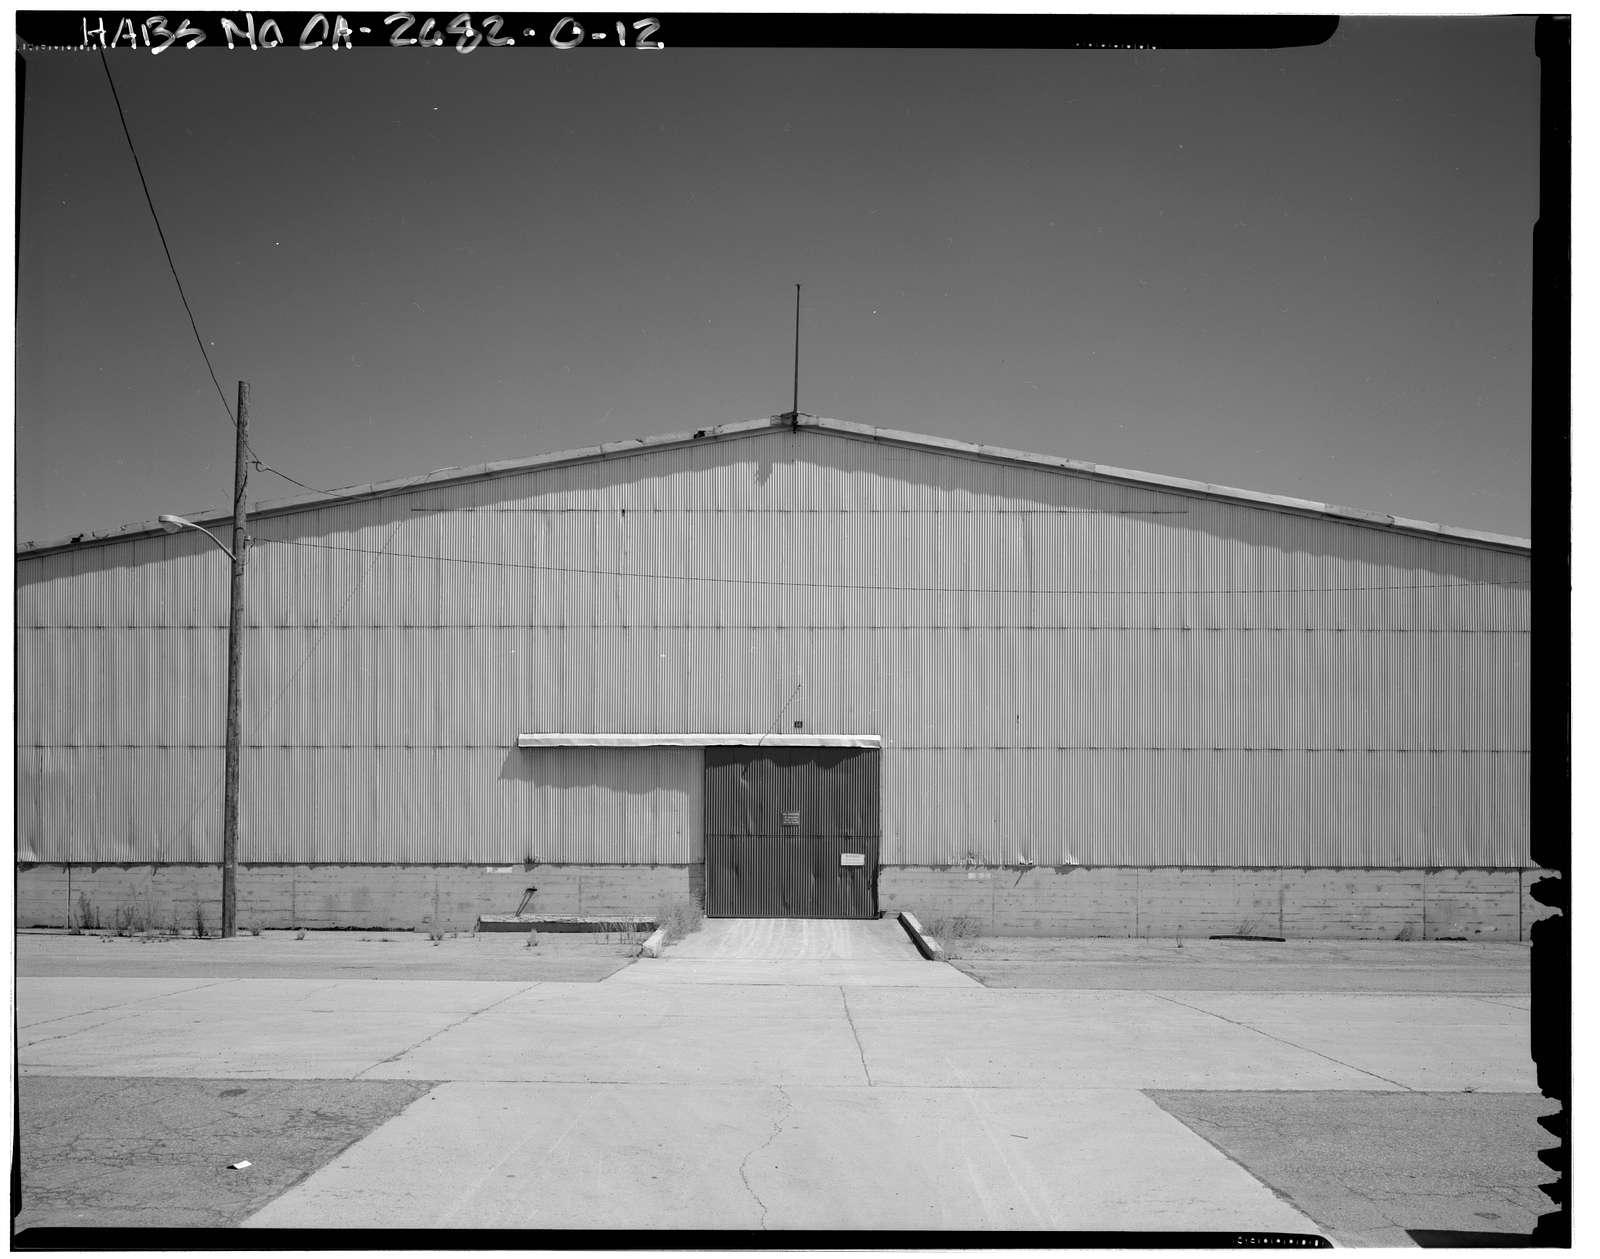 Naval Supply Annex Stockton, Steel Warehouse Type, Between James & Humphreys Drives south of Embarcadero, Stockton, San Joaquin County, CA